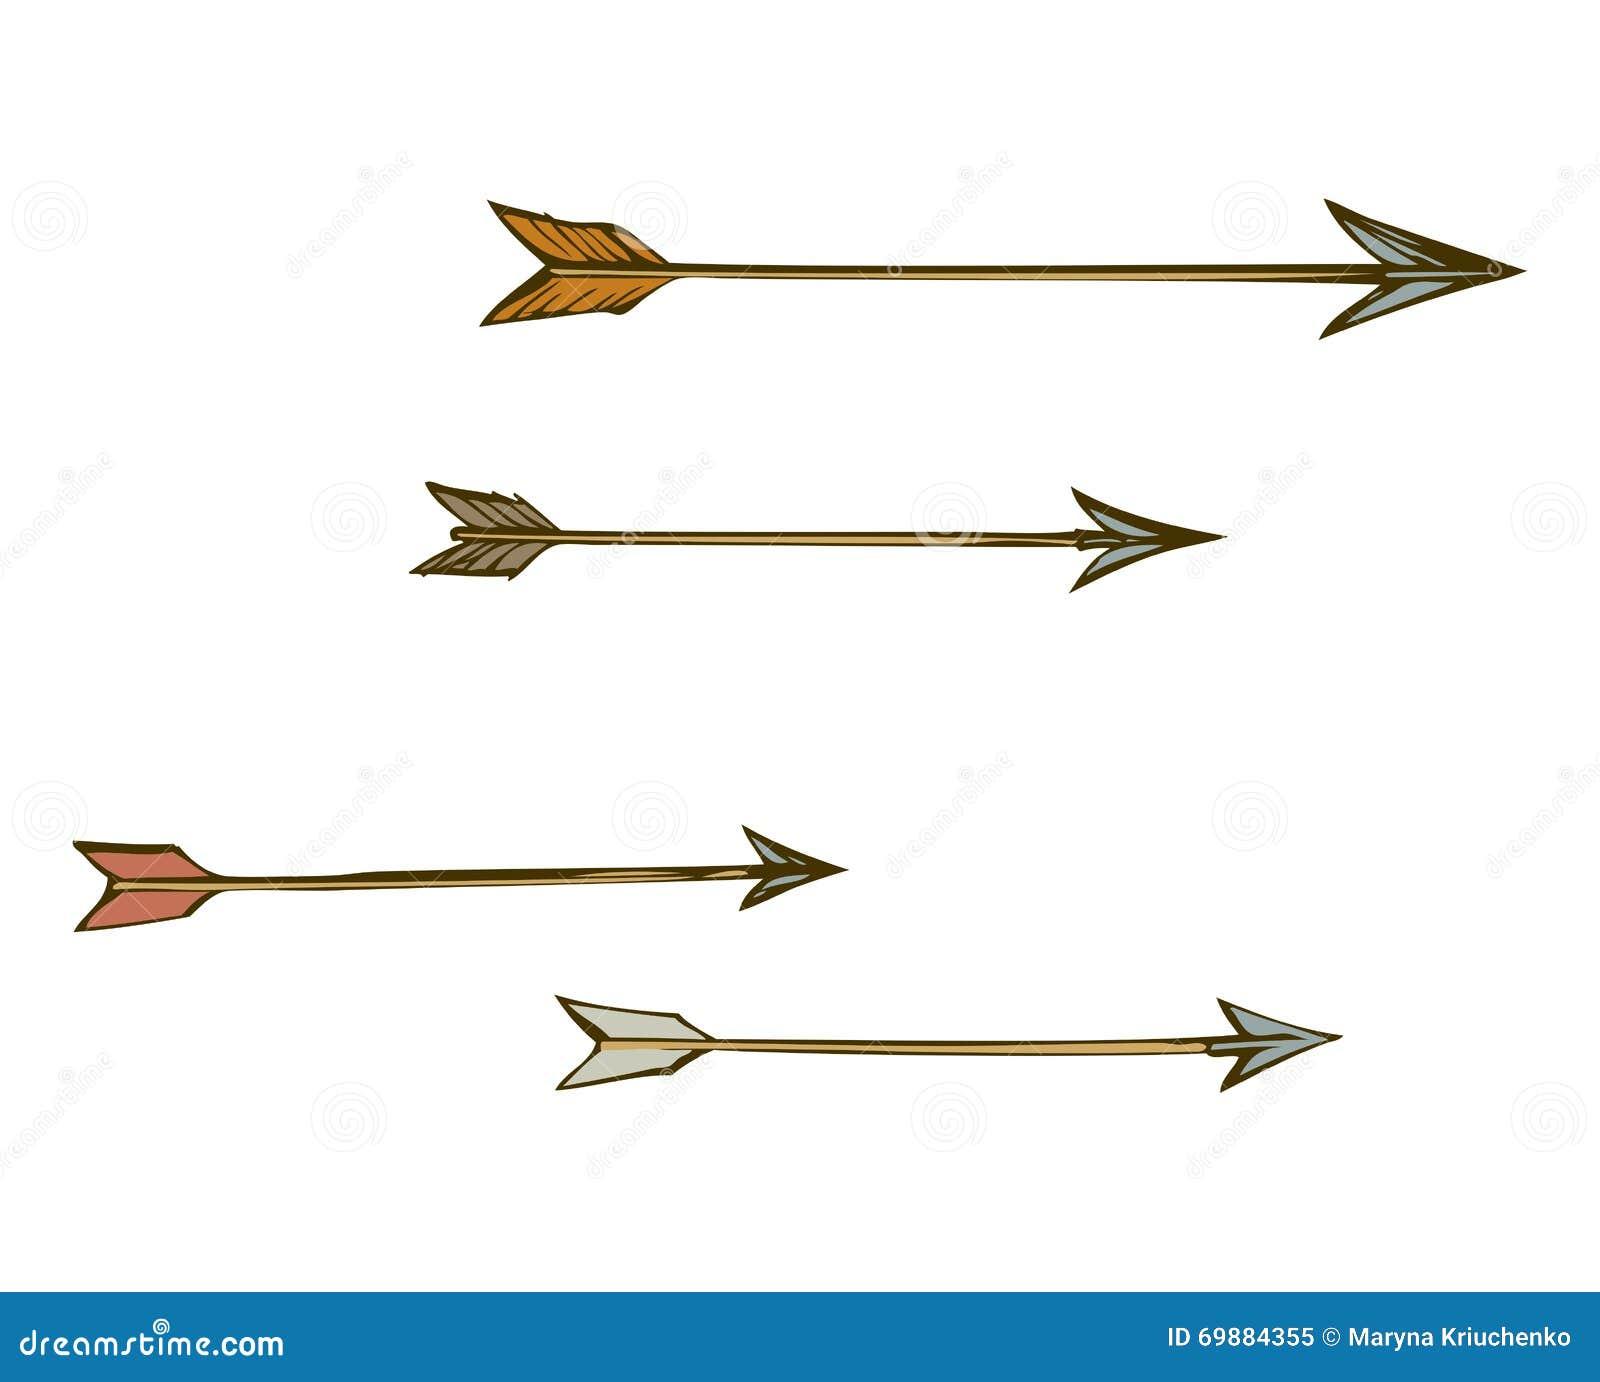 Arrows. Vector Drawing Stock Vector - Image: 69884355